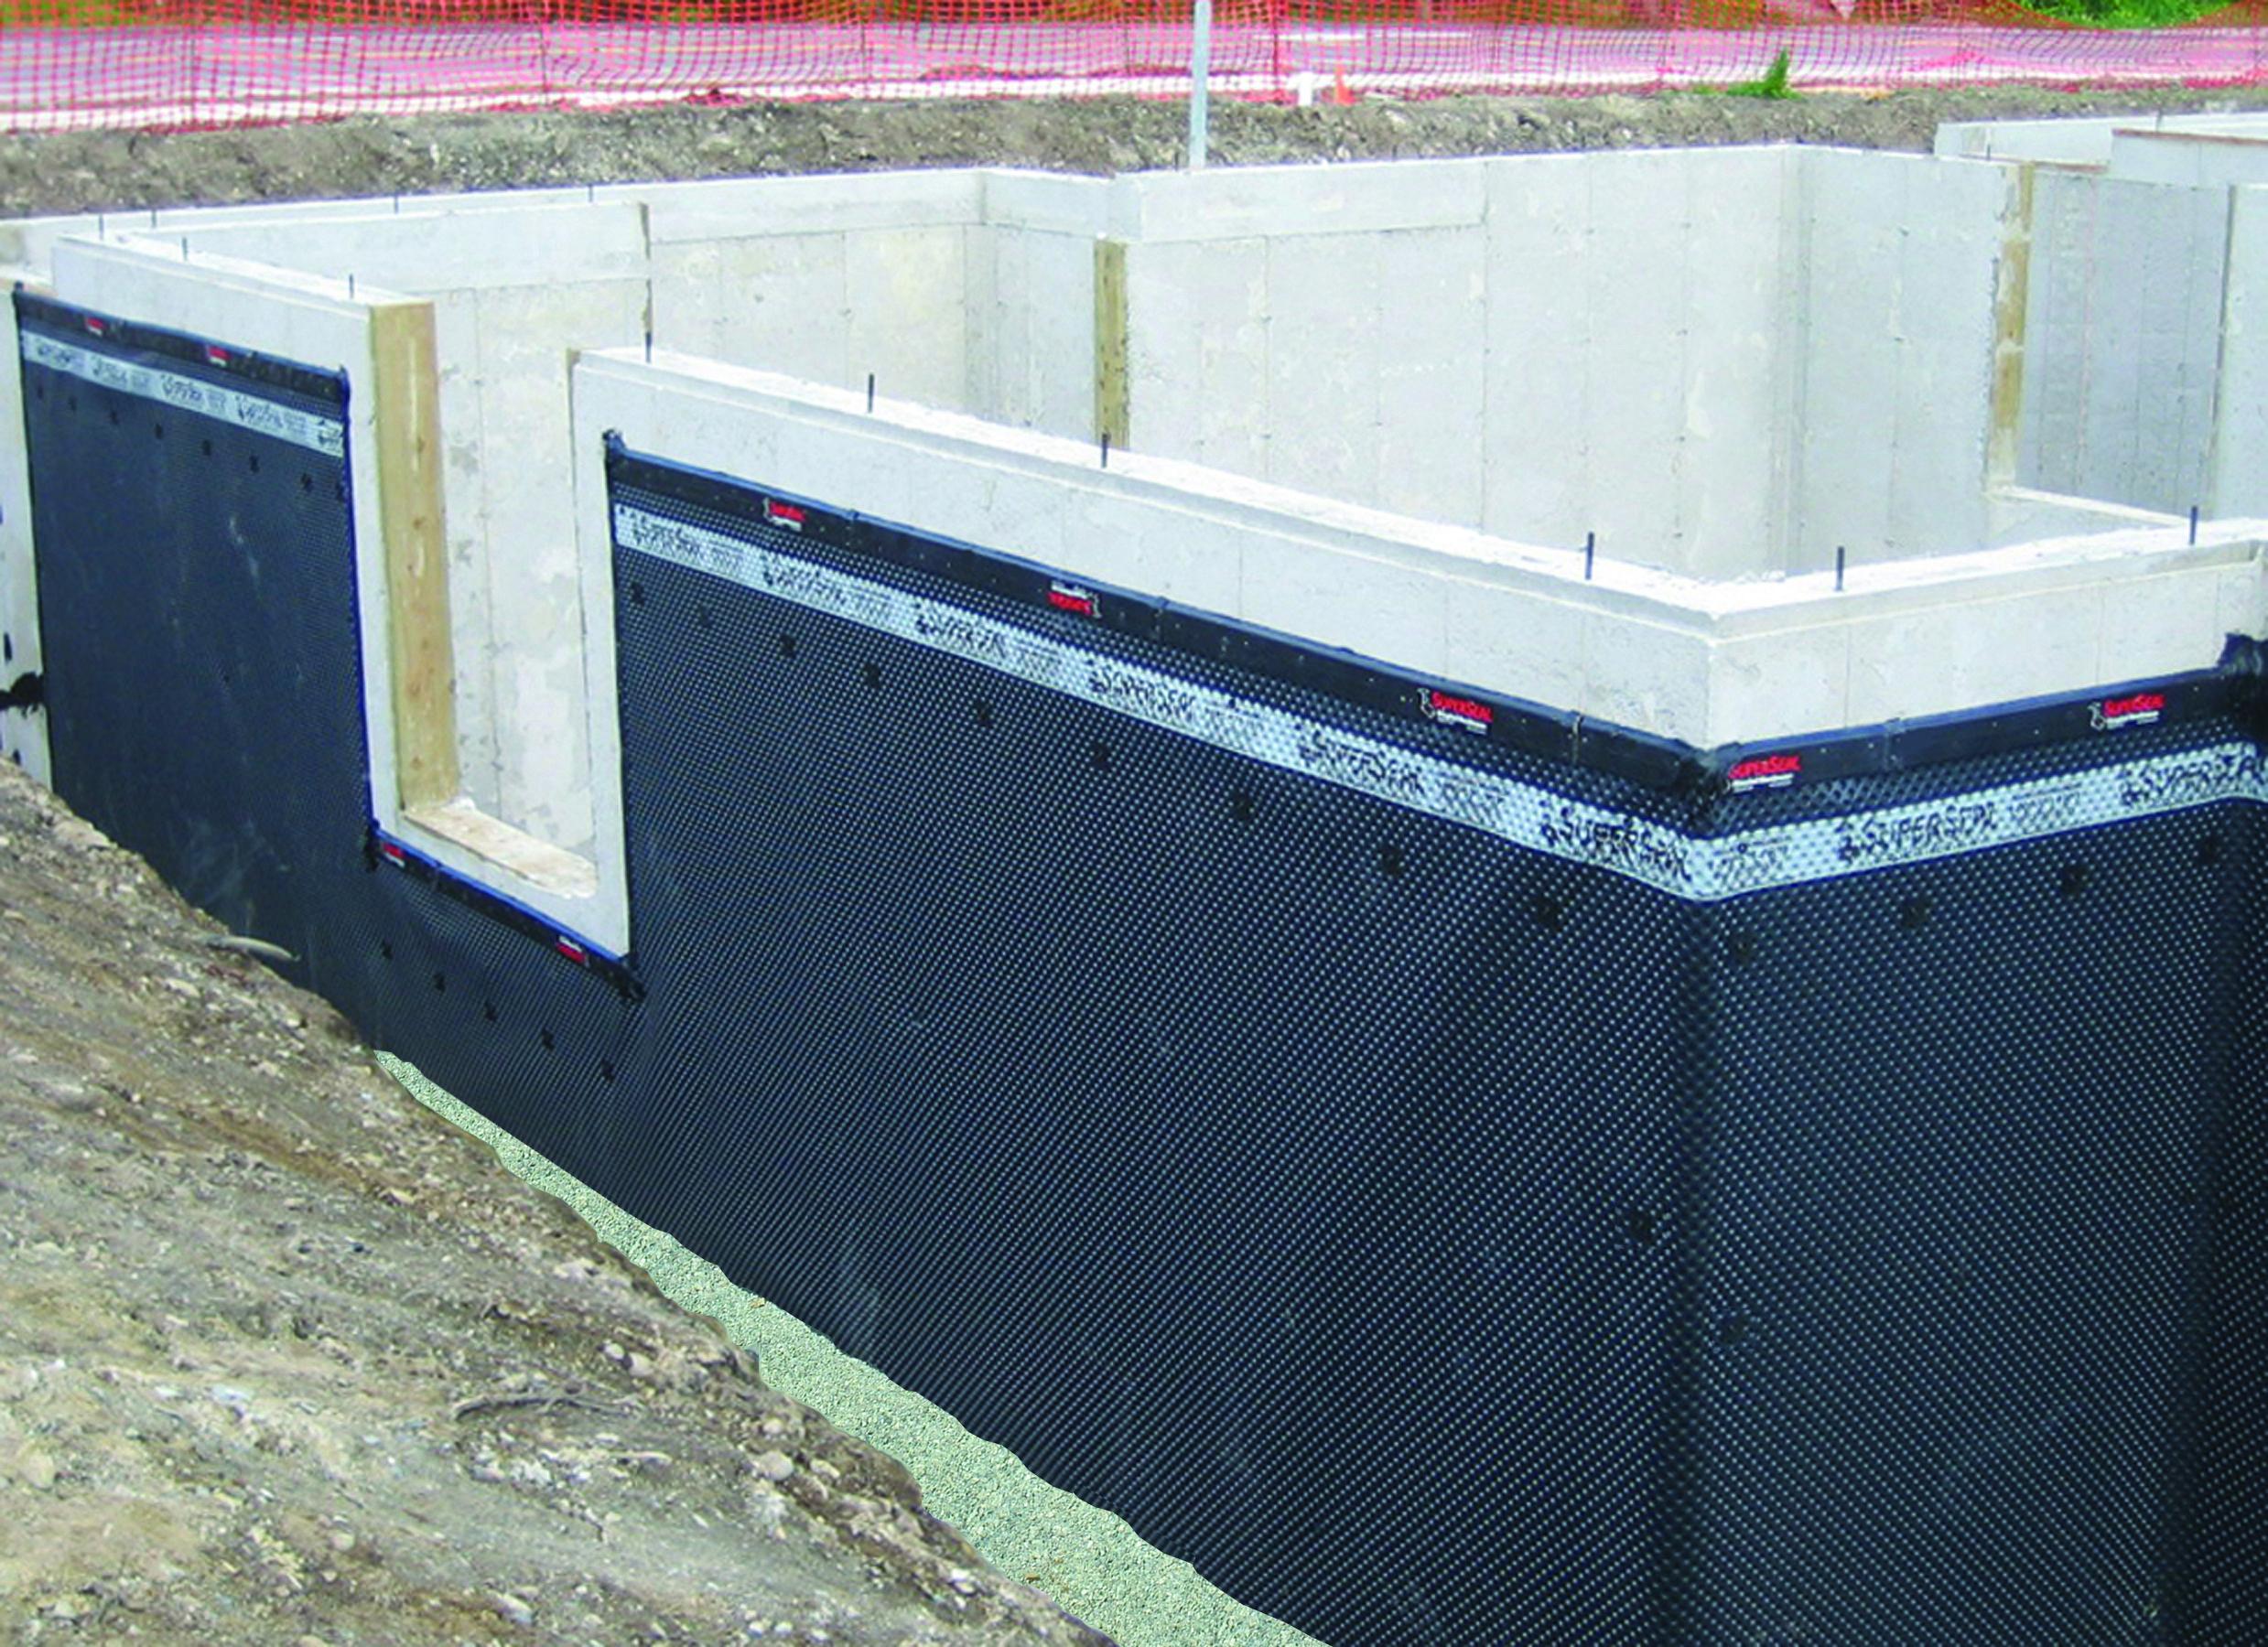 The Best Basement Waterproofing Method Waterproofing Basement Basement Insulation Waterproofing Basement Walls